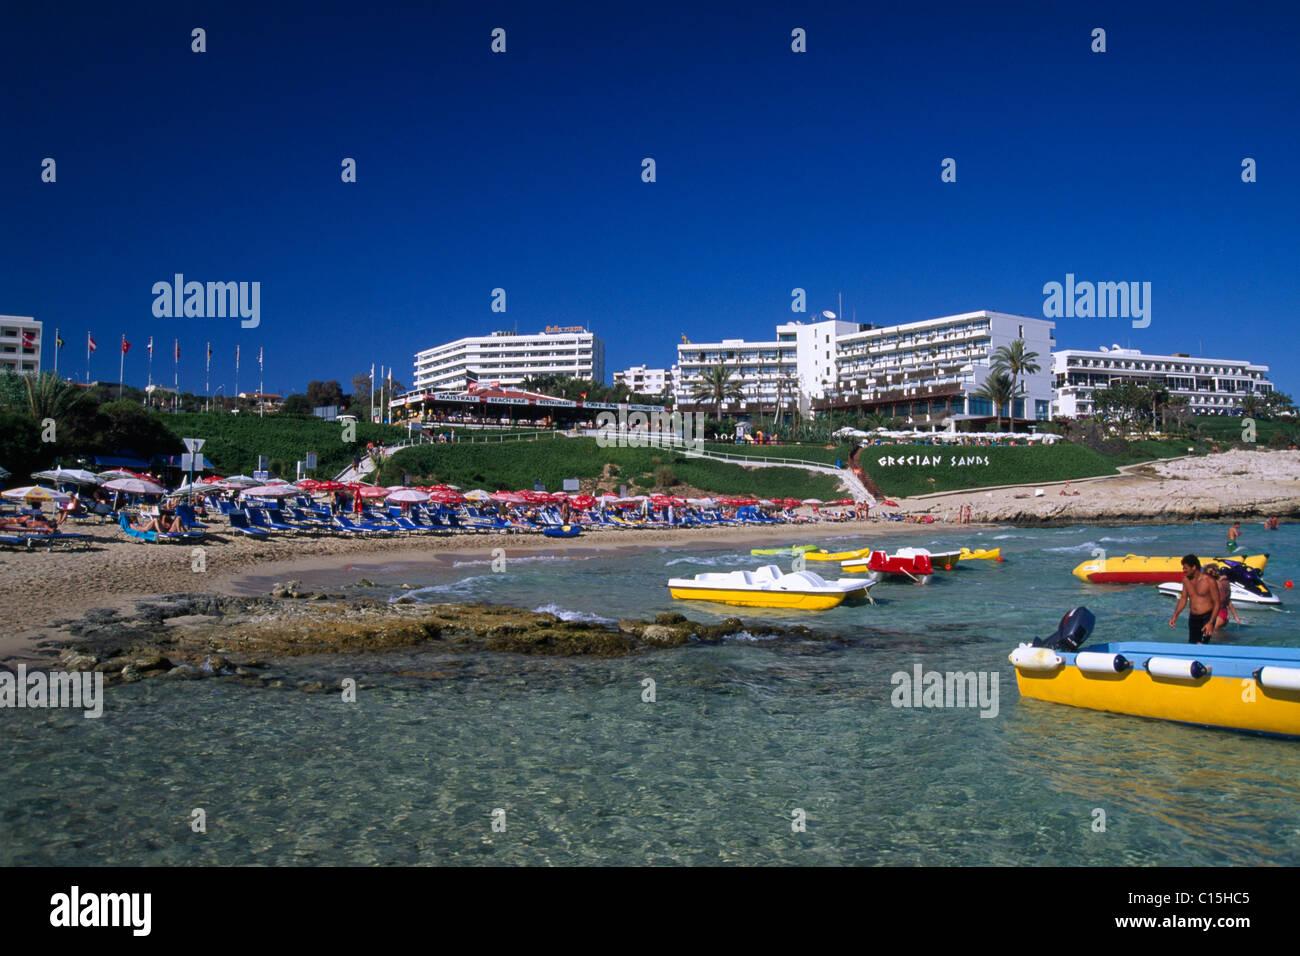 Grecian Sands Hotel, Agia Napa, Cyprus - Stock Image